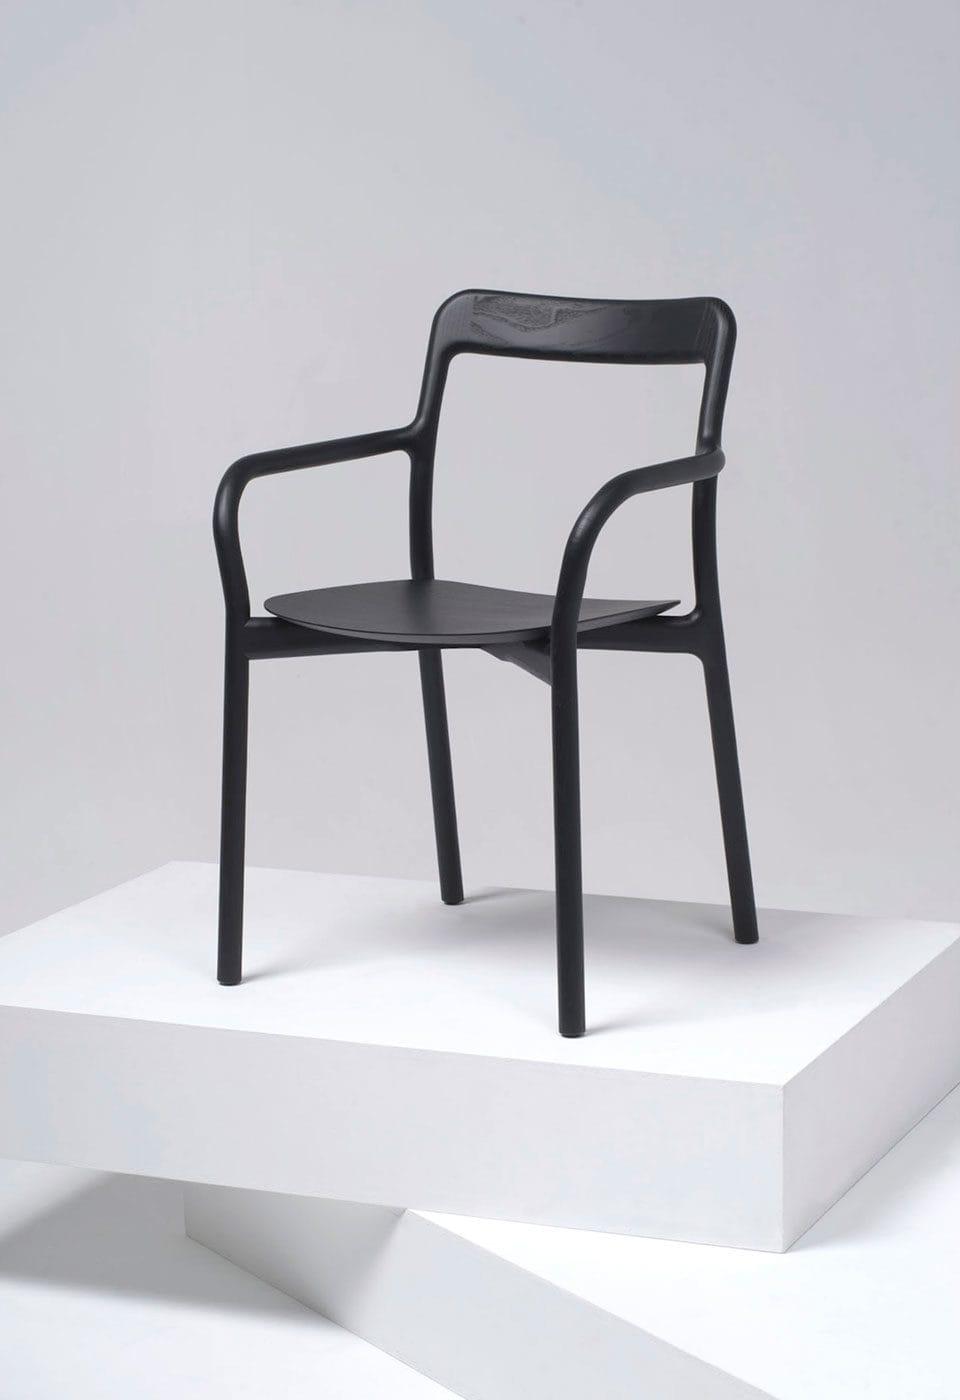 Mc2 Branca Chair By Sam Hecht Amp Kim Colin For Mattiazzi